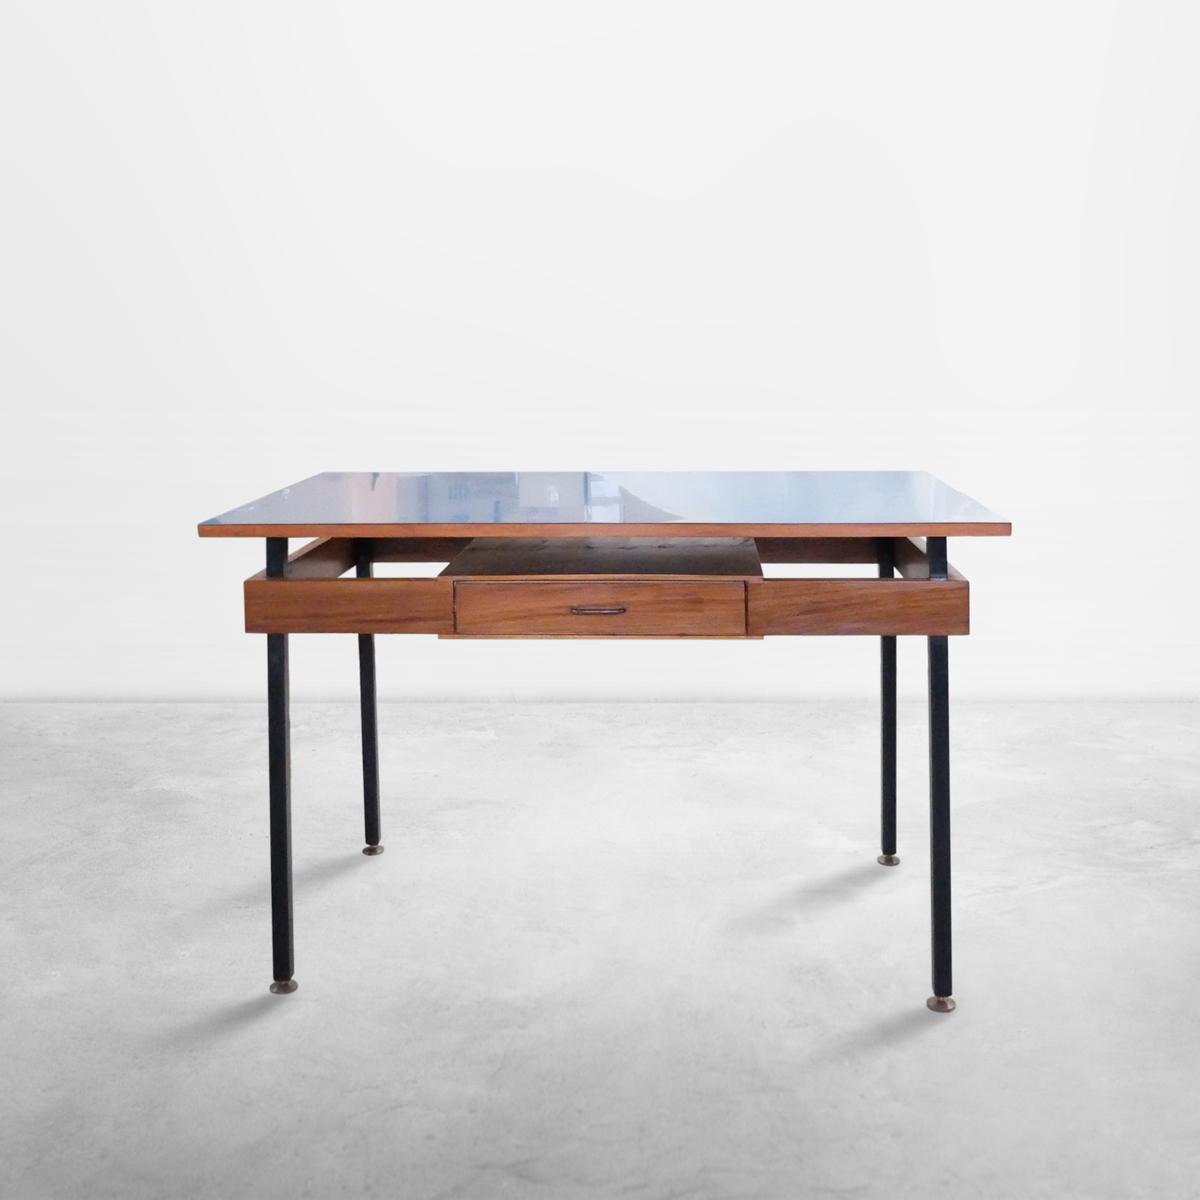 Italian Mid-Century Modern Desk with Blue Veneer Tabletop, 1950s